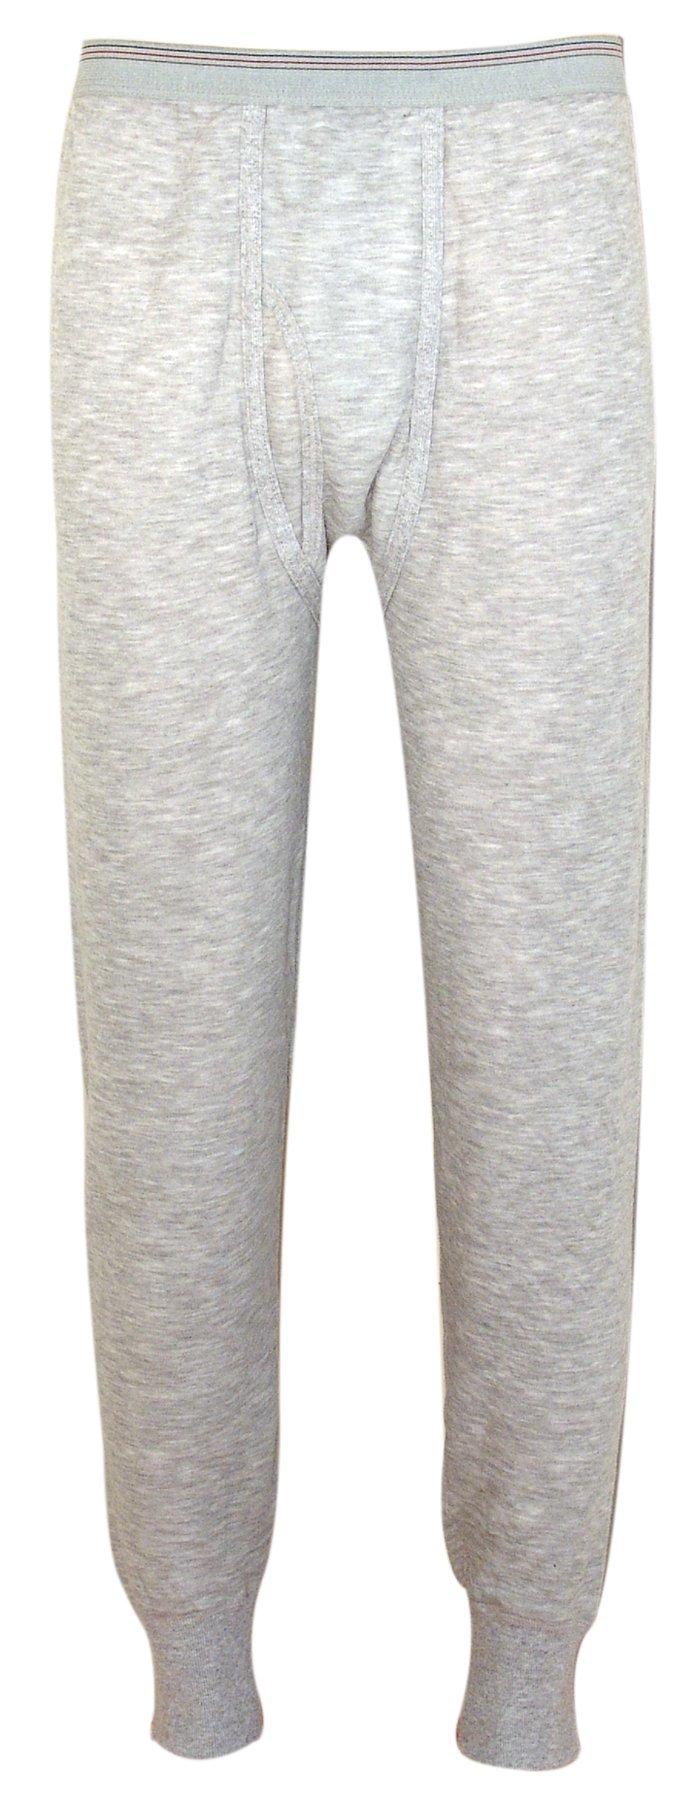 Indera Men's Two-Layer Performance Thermal Underwear Pant with Silvadur, HeatherGrey, Medium by Indera